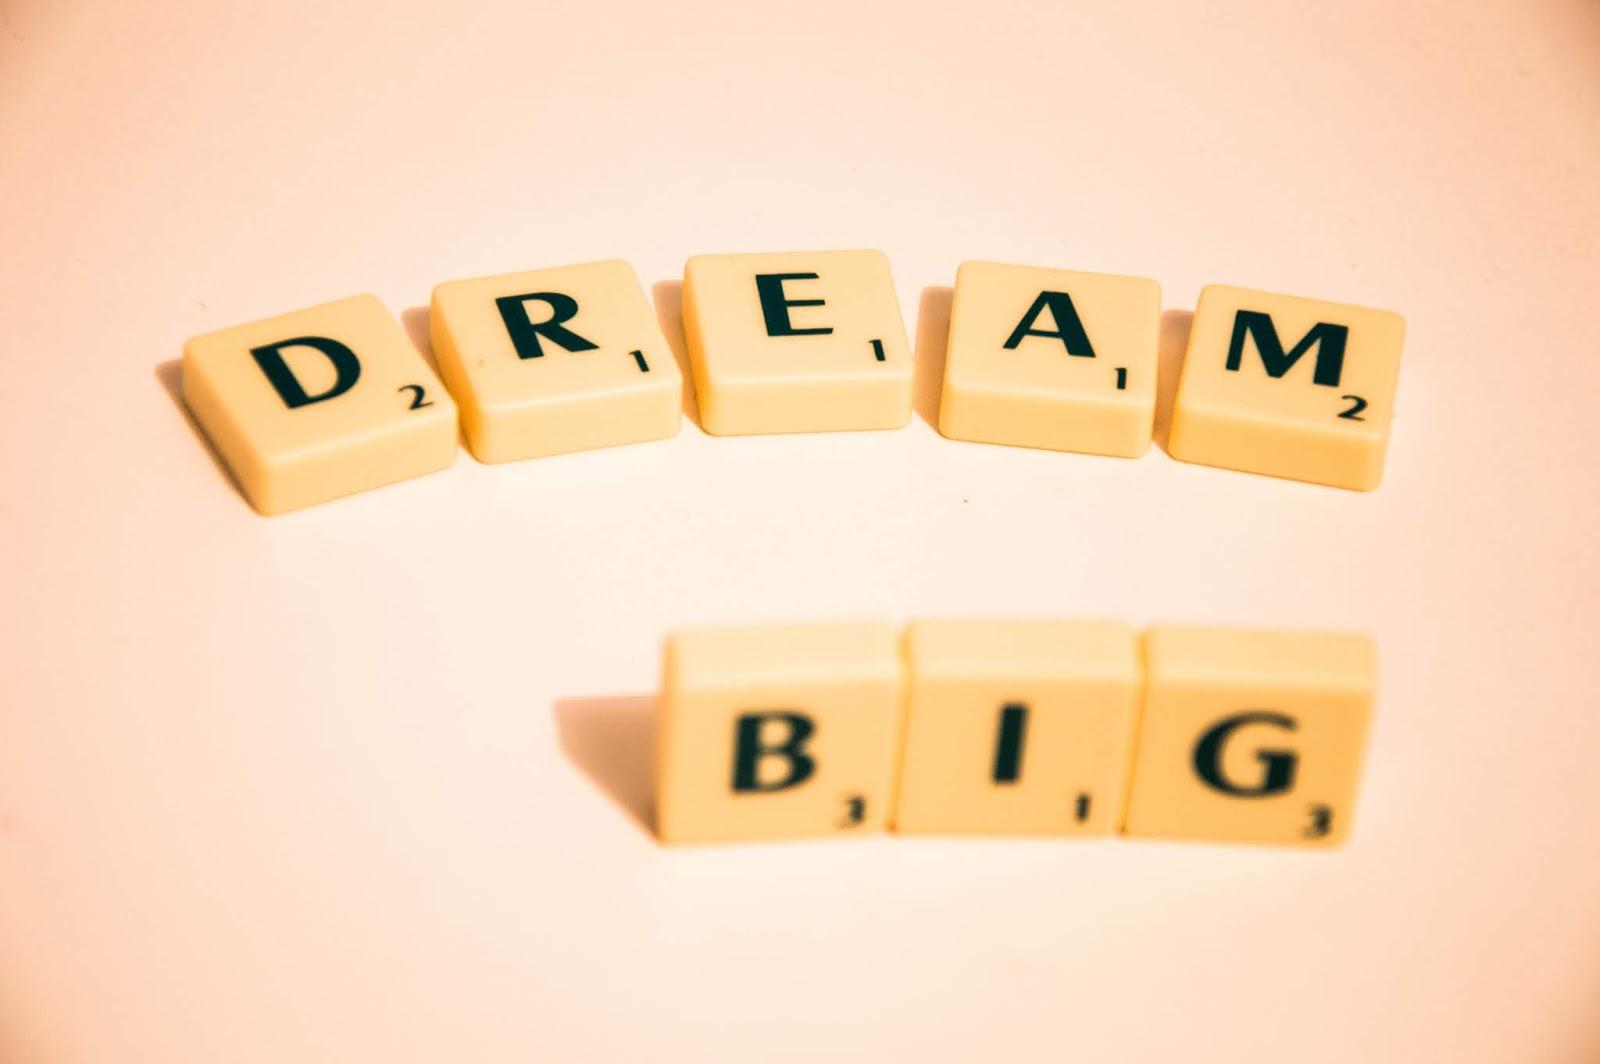 erasaan apa namanya ya ketika kita baca tulisan seseorang dan sepertinya penulis menyampai Everything Starts With A Dream